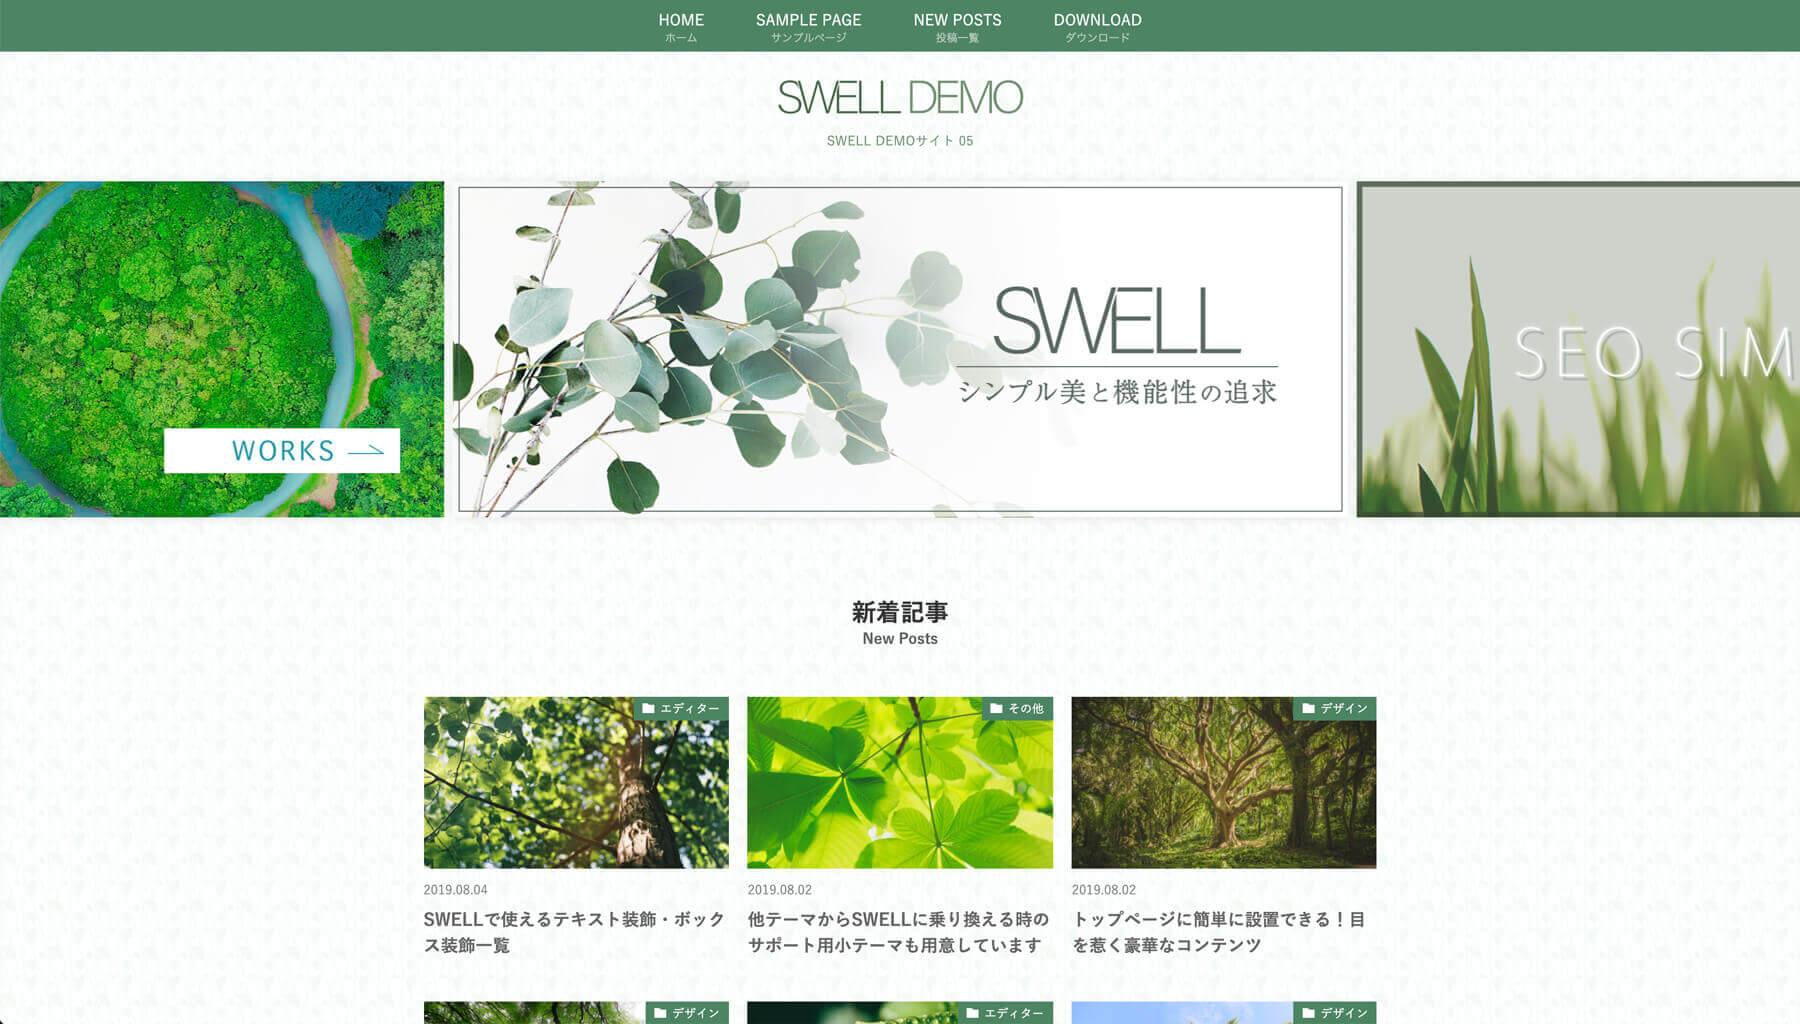 SWELL DEMO 05